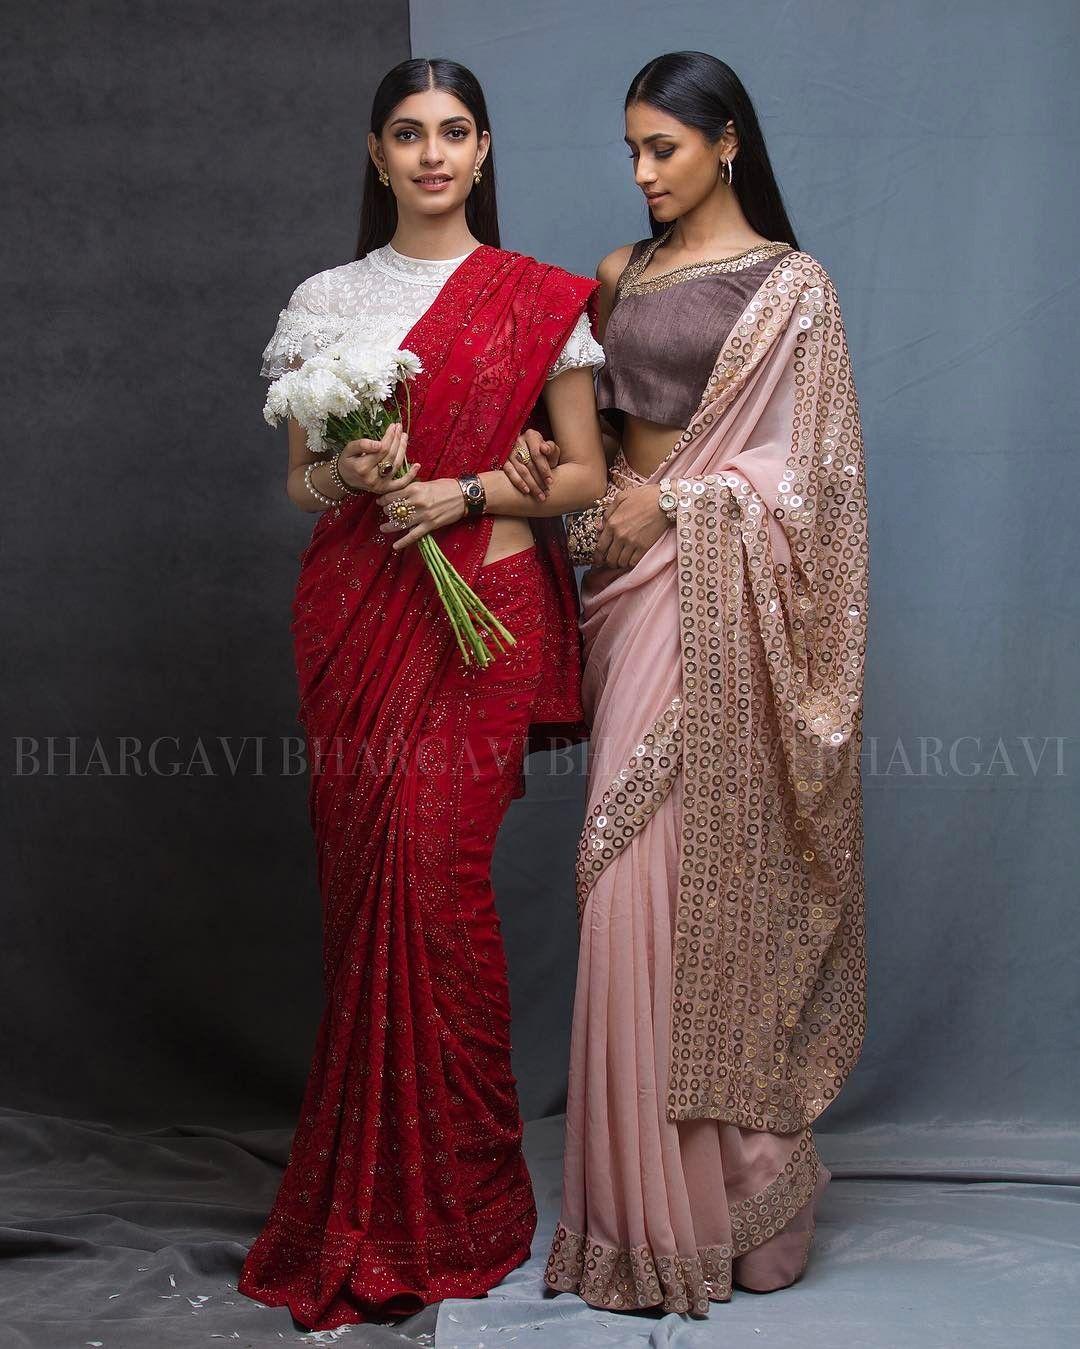 11 Designer Saree Ideas To Pick For Wedding Reception Parties